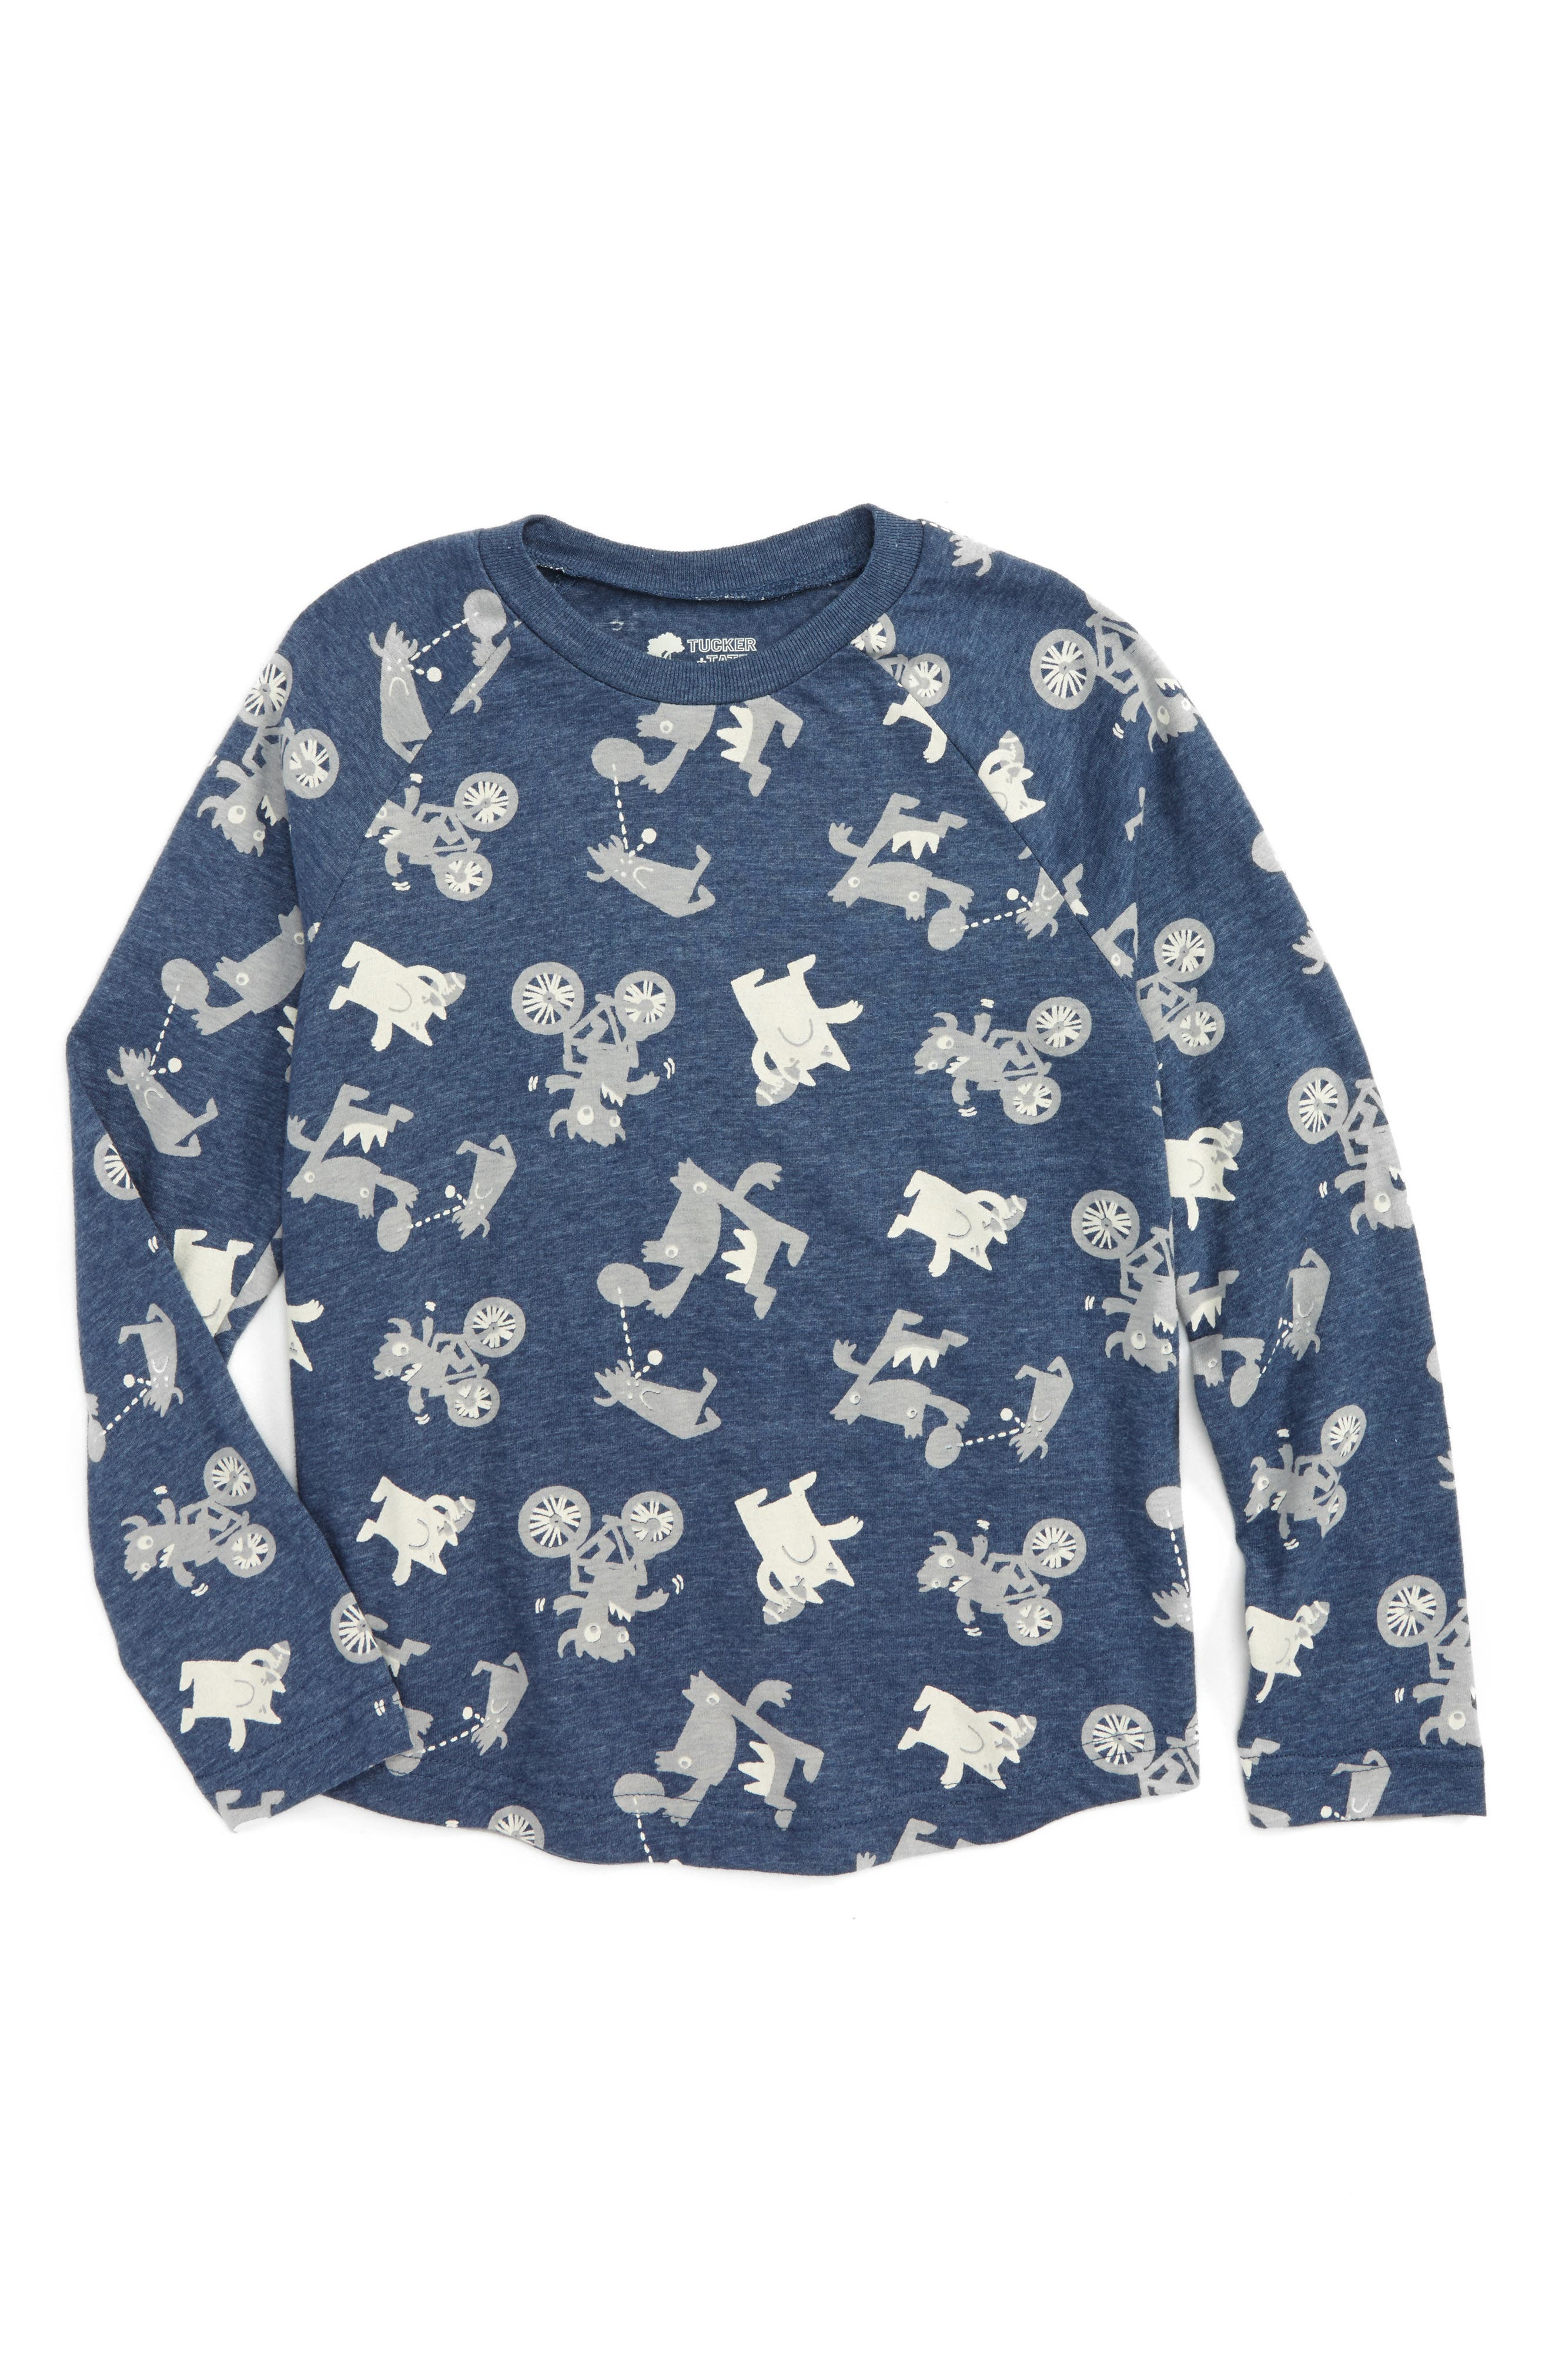 Alternate Image 1 Selected - Tucker + Tate Graphic T-Shirt (Toddler Boys & Little Boys)